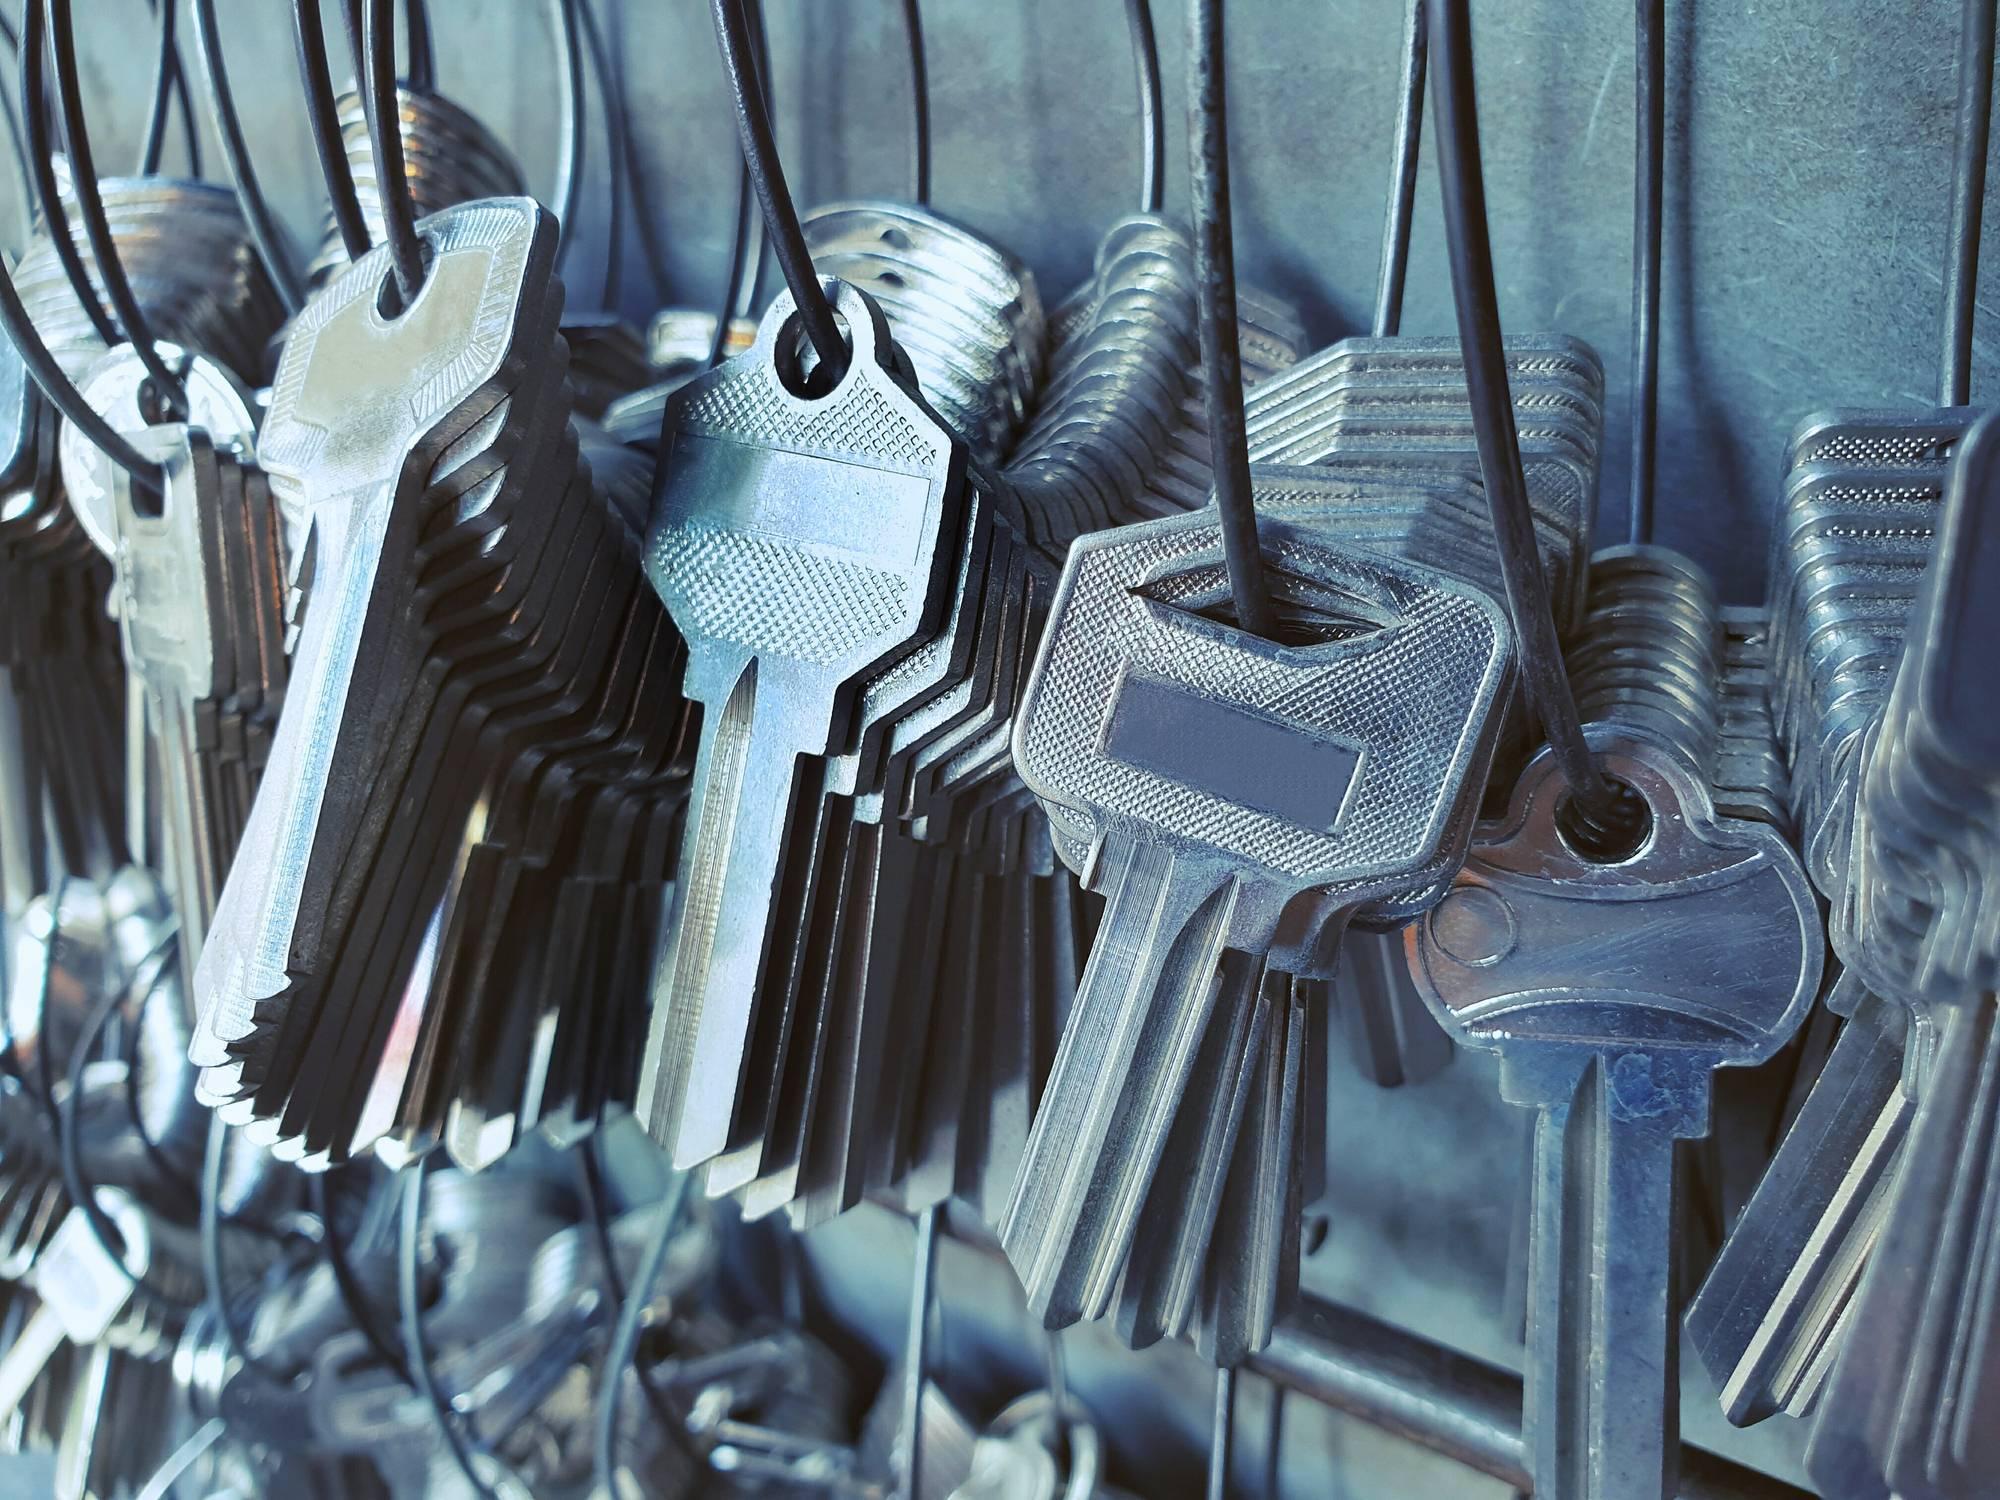 serrurier clés intervention